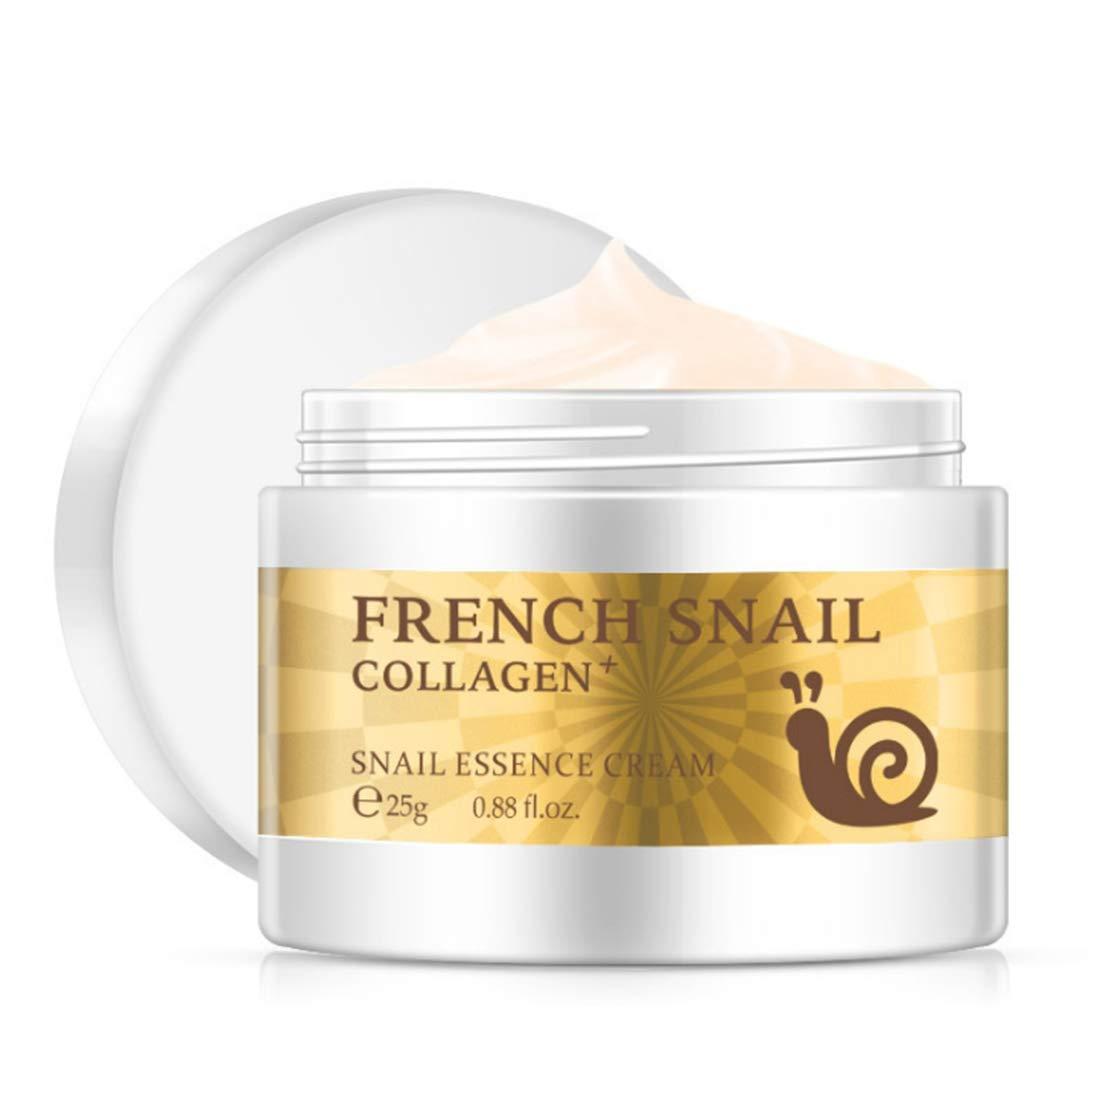 Loweryeah Snail Repair Anti-aging Cream 25g Collagen Moisturizing Nourish Repair Damaged Face Care Hyaluronic Acid Cream by Loweryeah (Image #1)